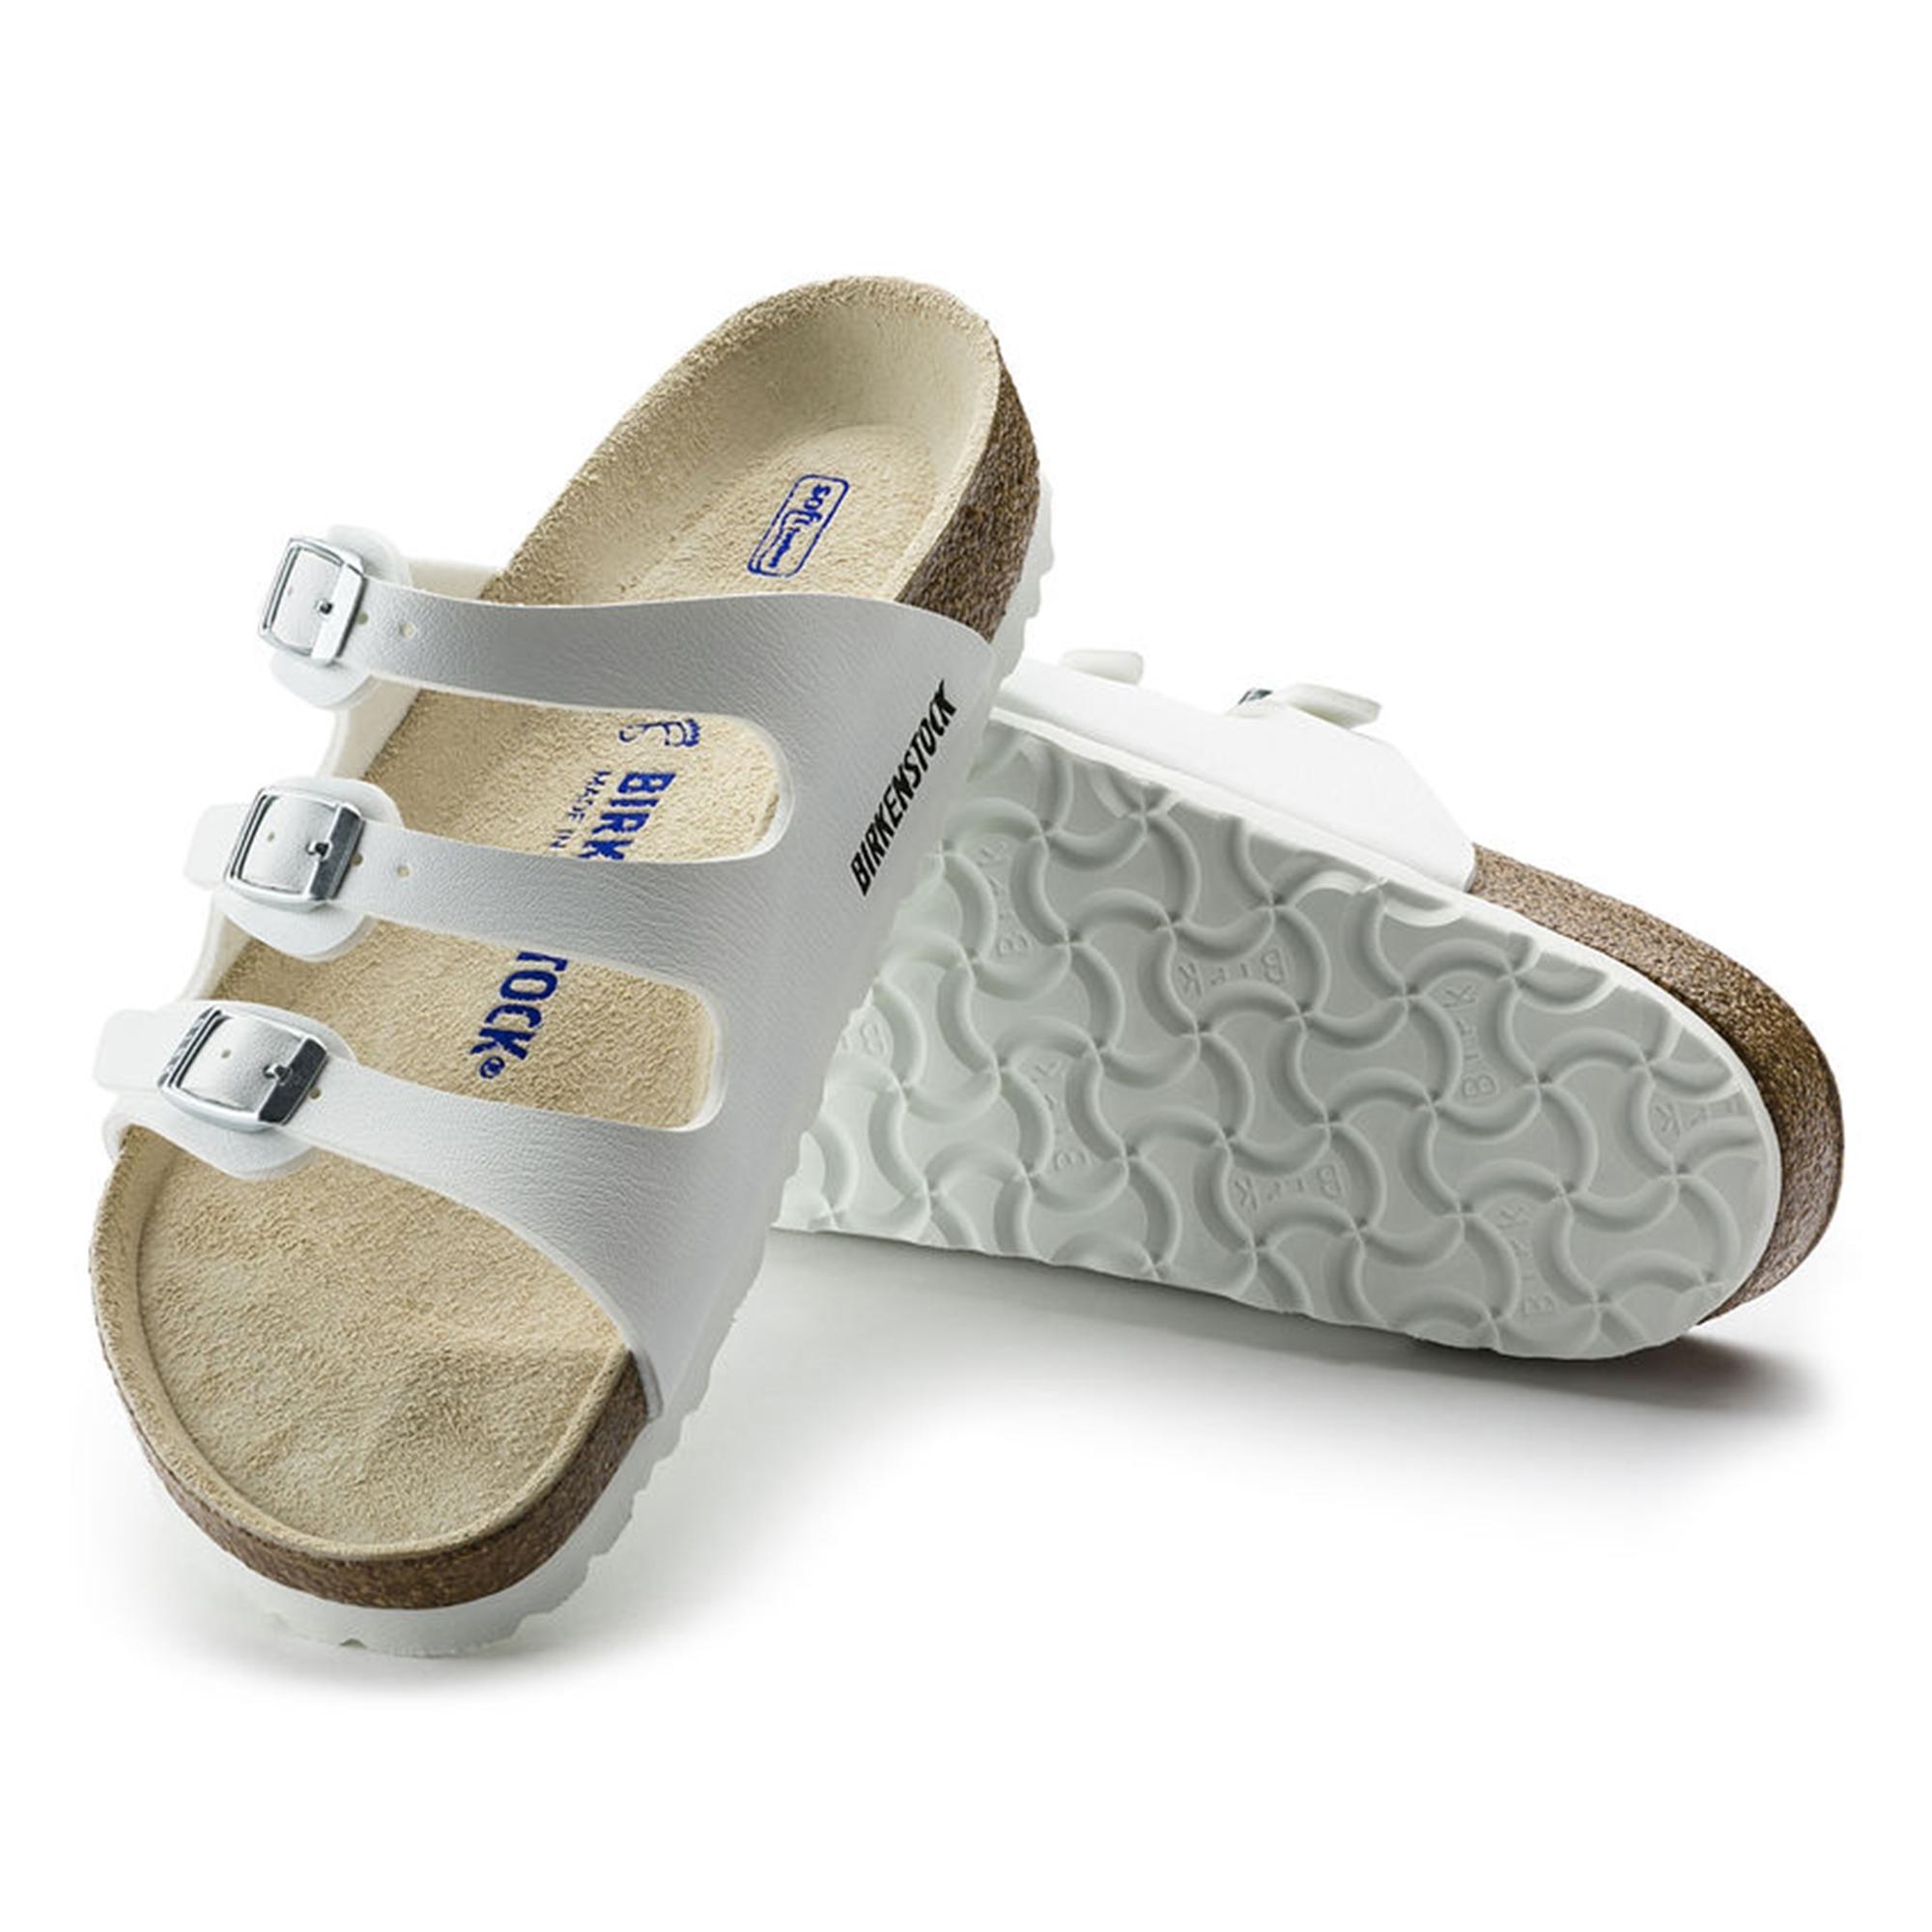 8d1146cb4 Birkenstock FLORIDA 54061 Ladies Three Strap Sandals White